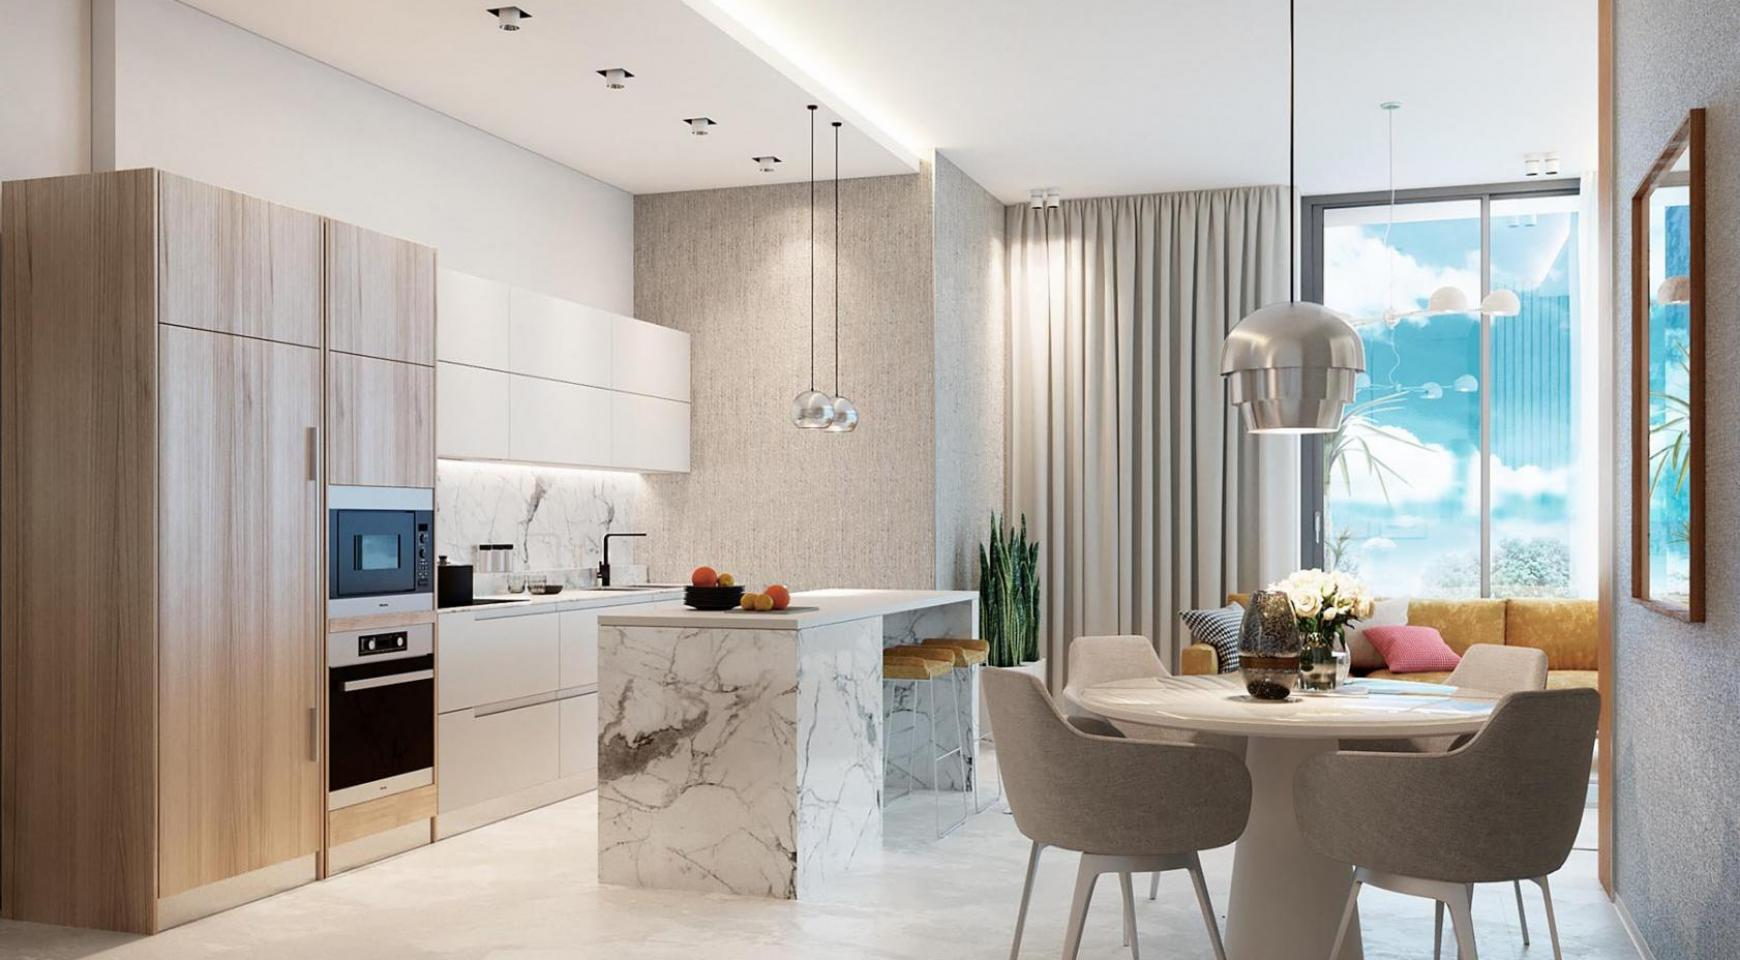 Contemporary 2 Bedroom Apartment in a New Complex near the Sea - 1